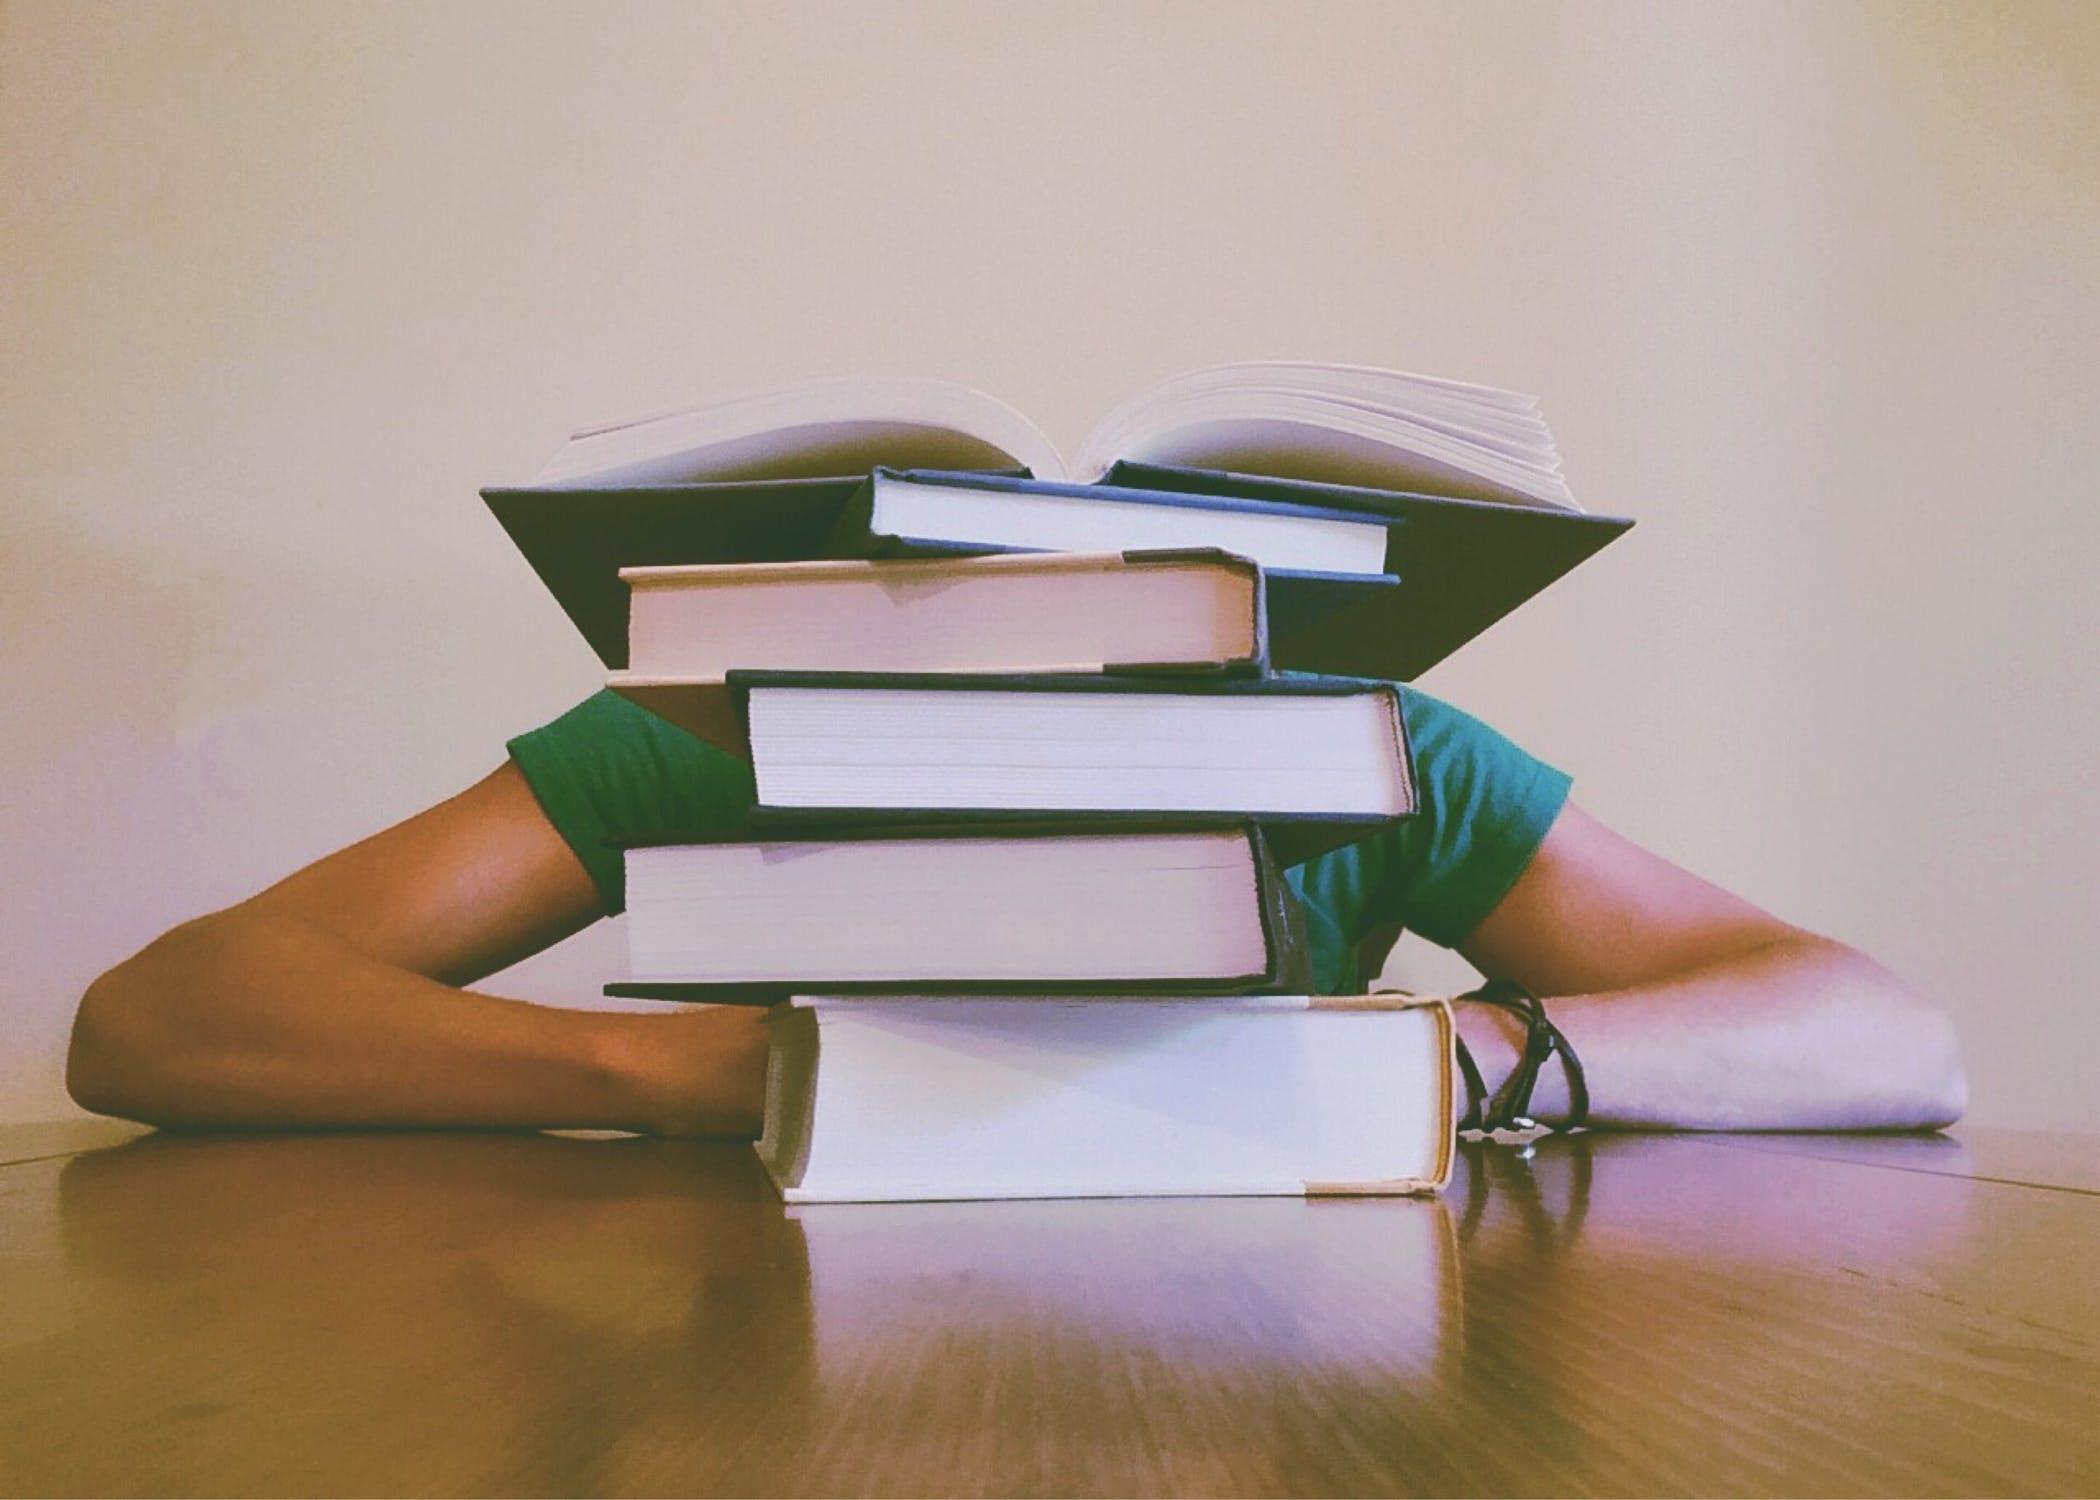 Methodologies of Adult Learning